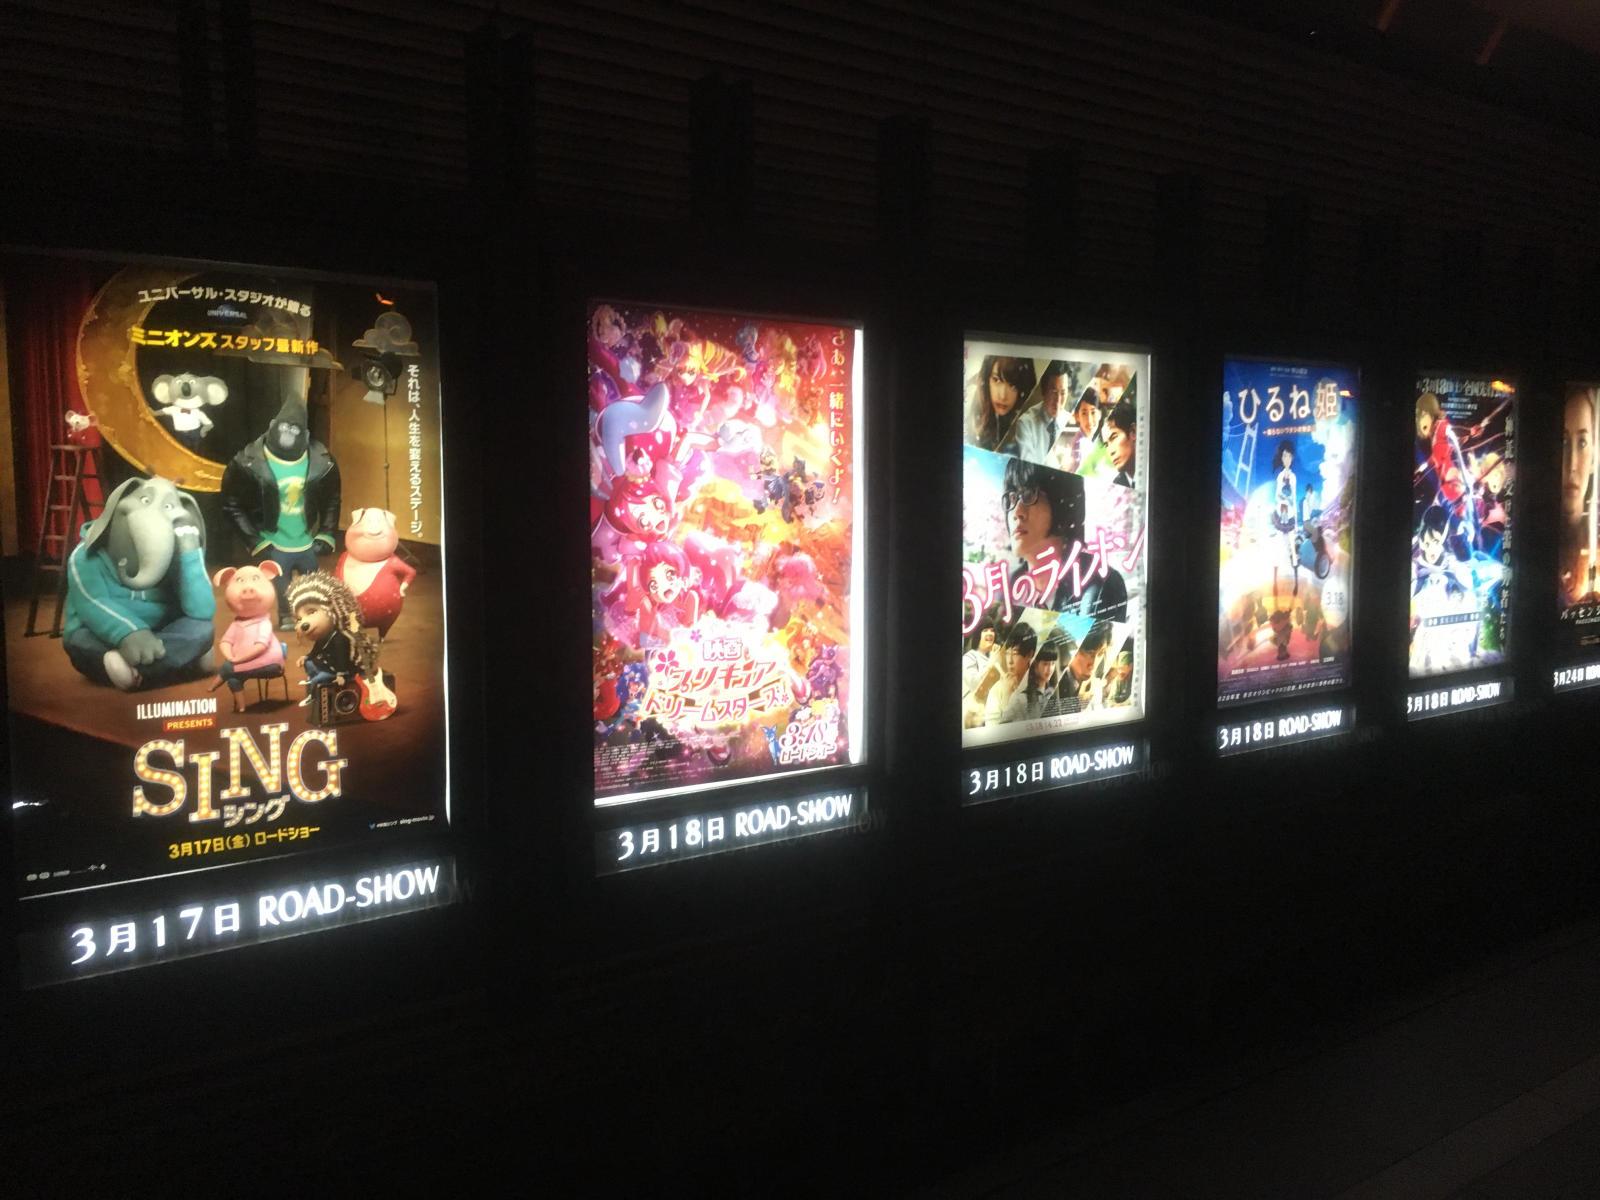 go see a movie a guide to japanese movie theaters odigo